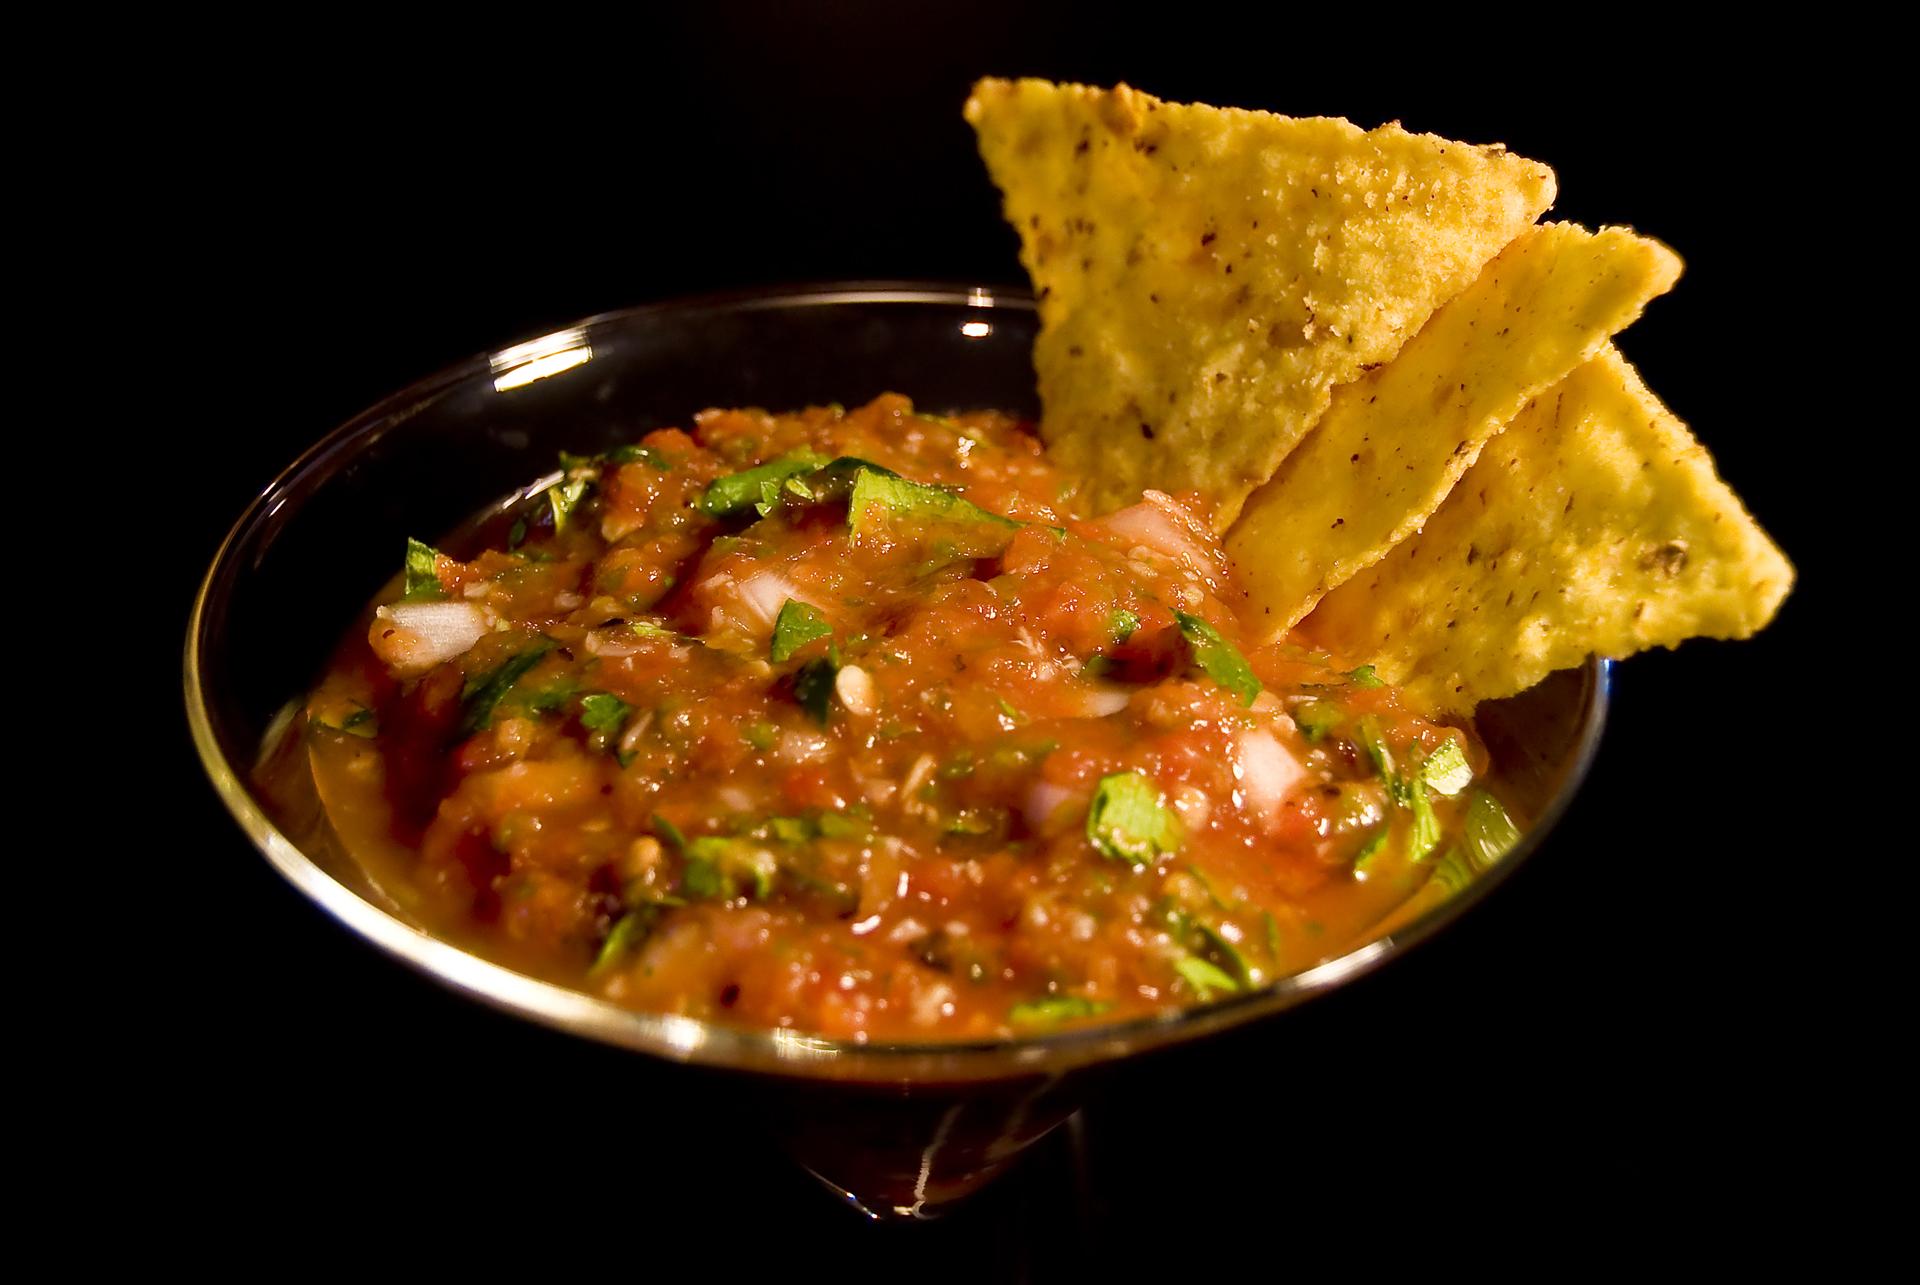 ... corn salsa fire roasted tomato and black roasted corn and tomato salsa